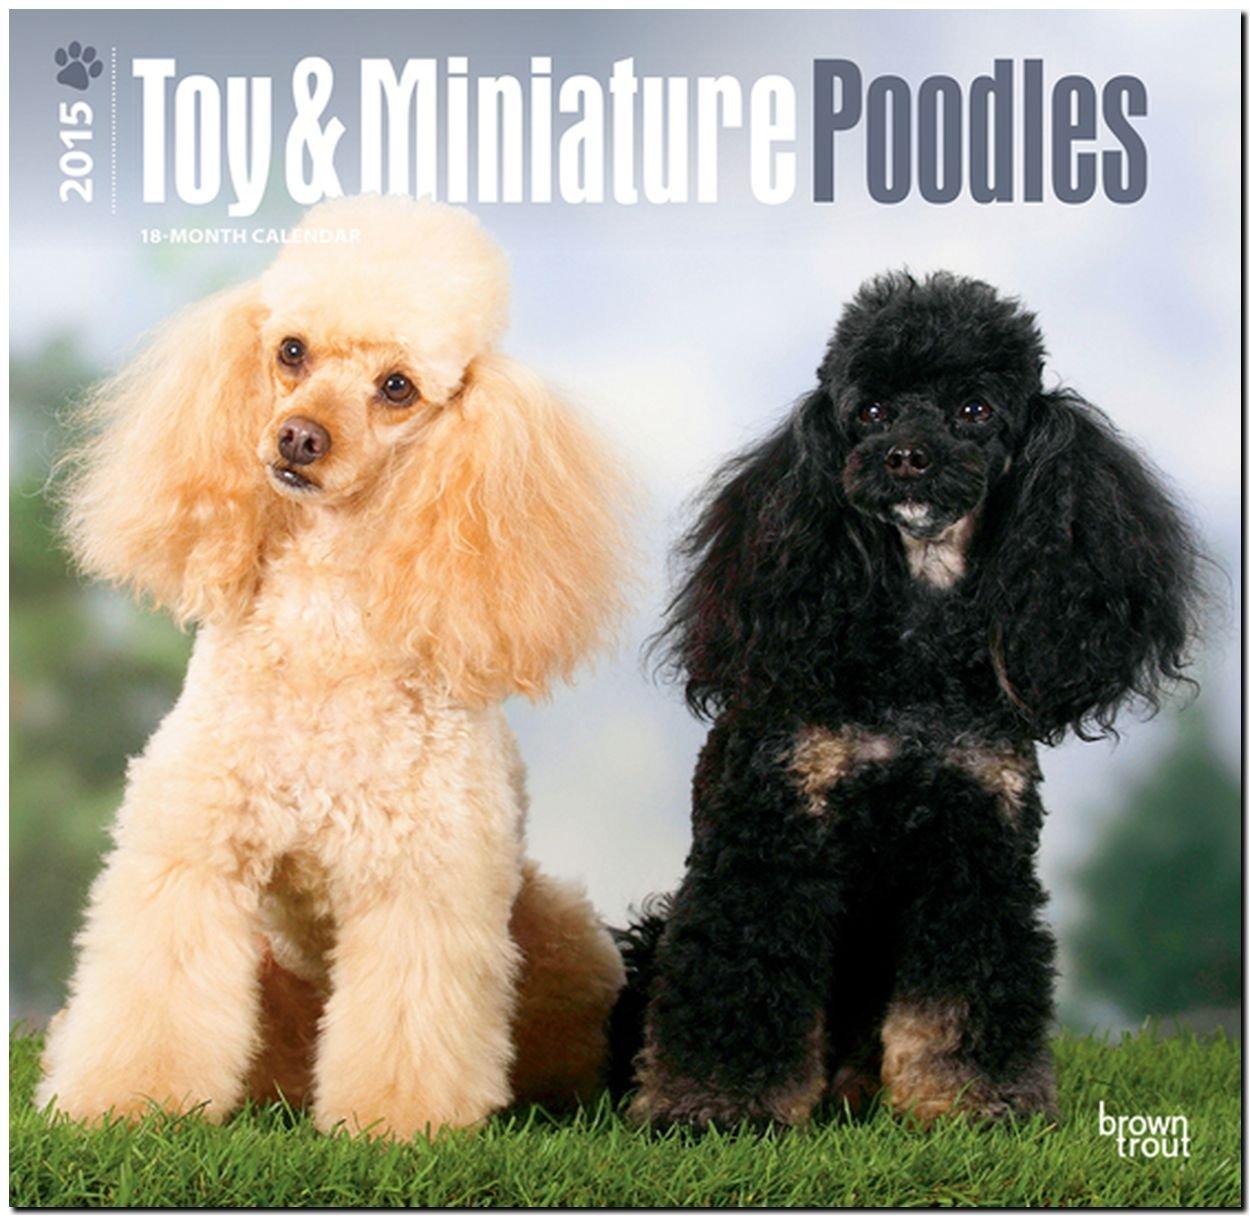 Toy and Miniature Poodles 2015 - Toypudel und Zwergpudel: Original BrownTrout-Kalender [Mehrsprachig] [Kalender]